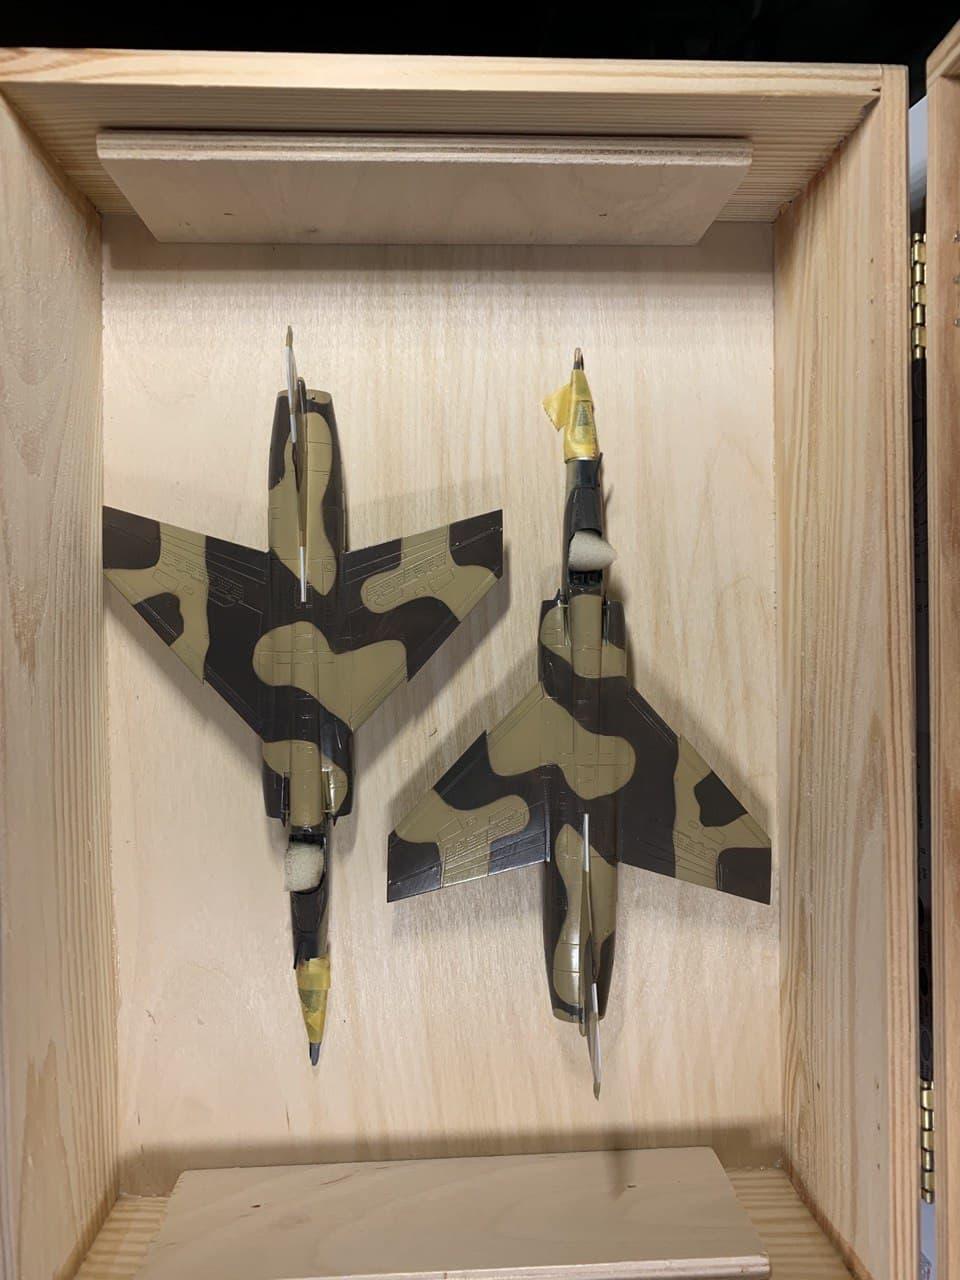 Mirage F1EQ4 ravitailleur - Irak - Special Hobby + Yahu 1/72 - Page 2 Photo_10